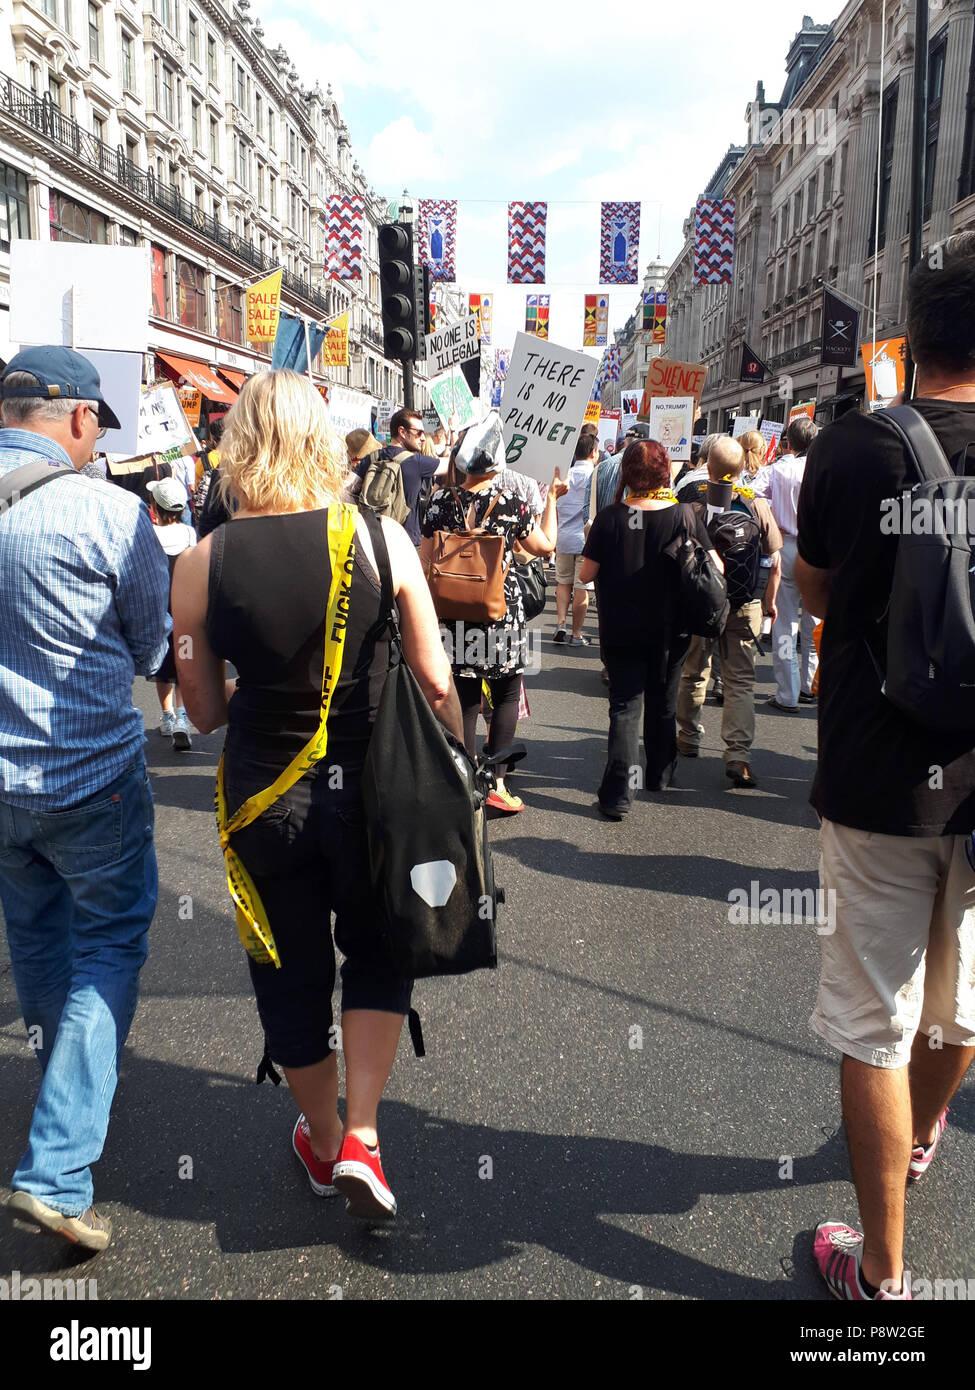 London, UK. 13th July 2018. 13/7/2018 Trump Demo Portland Place, Piccadily Circus to Trafalgar Sq  London - credit Glamourstock Credit: glamourstock/Alamy Live News Stock Photo